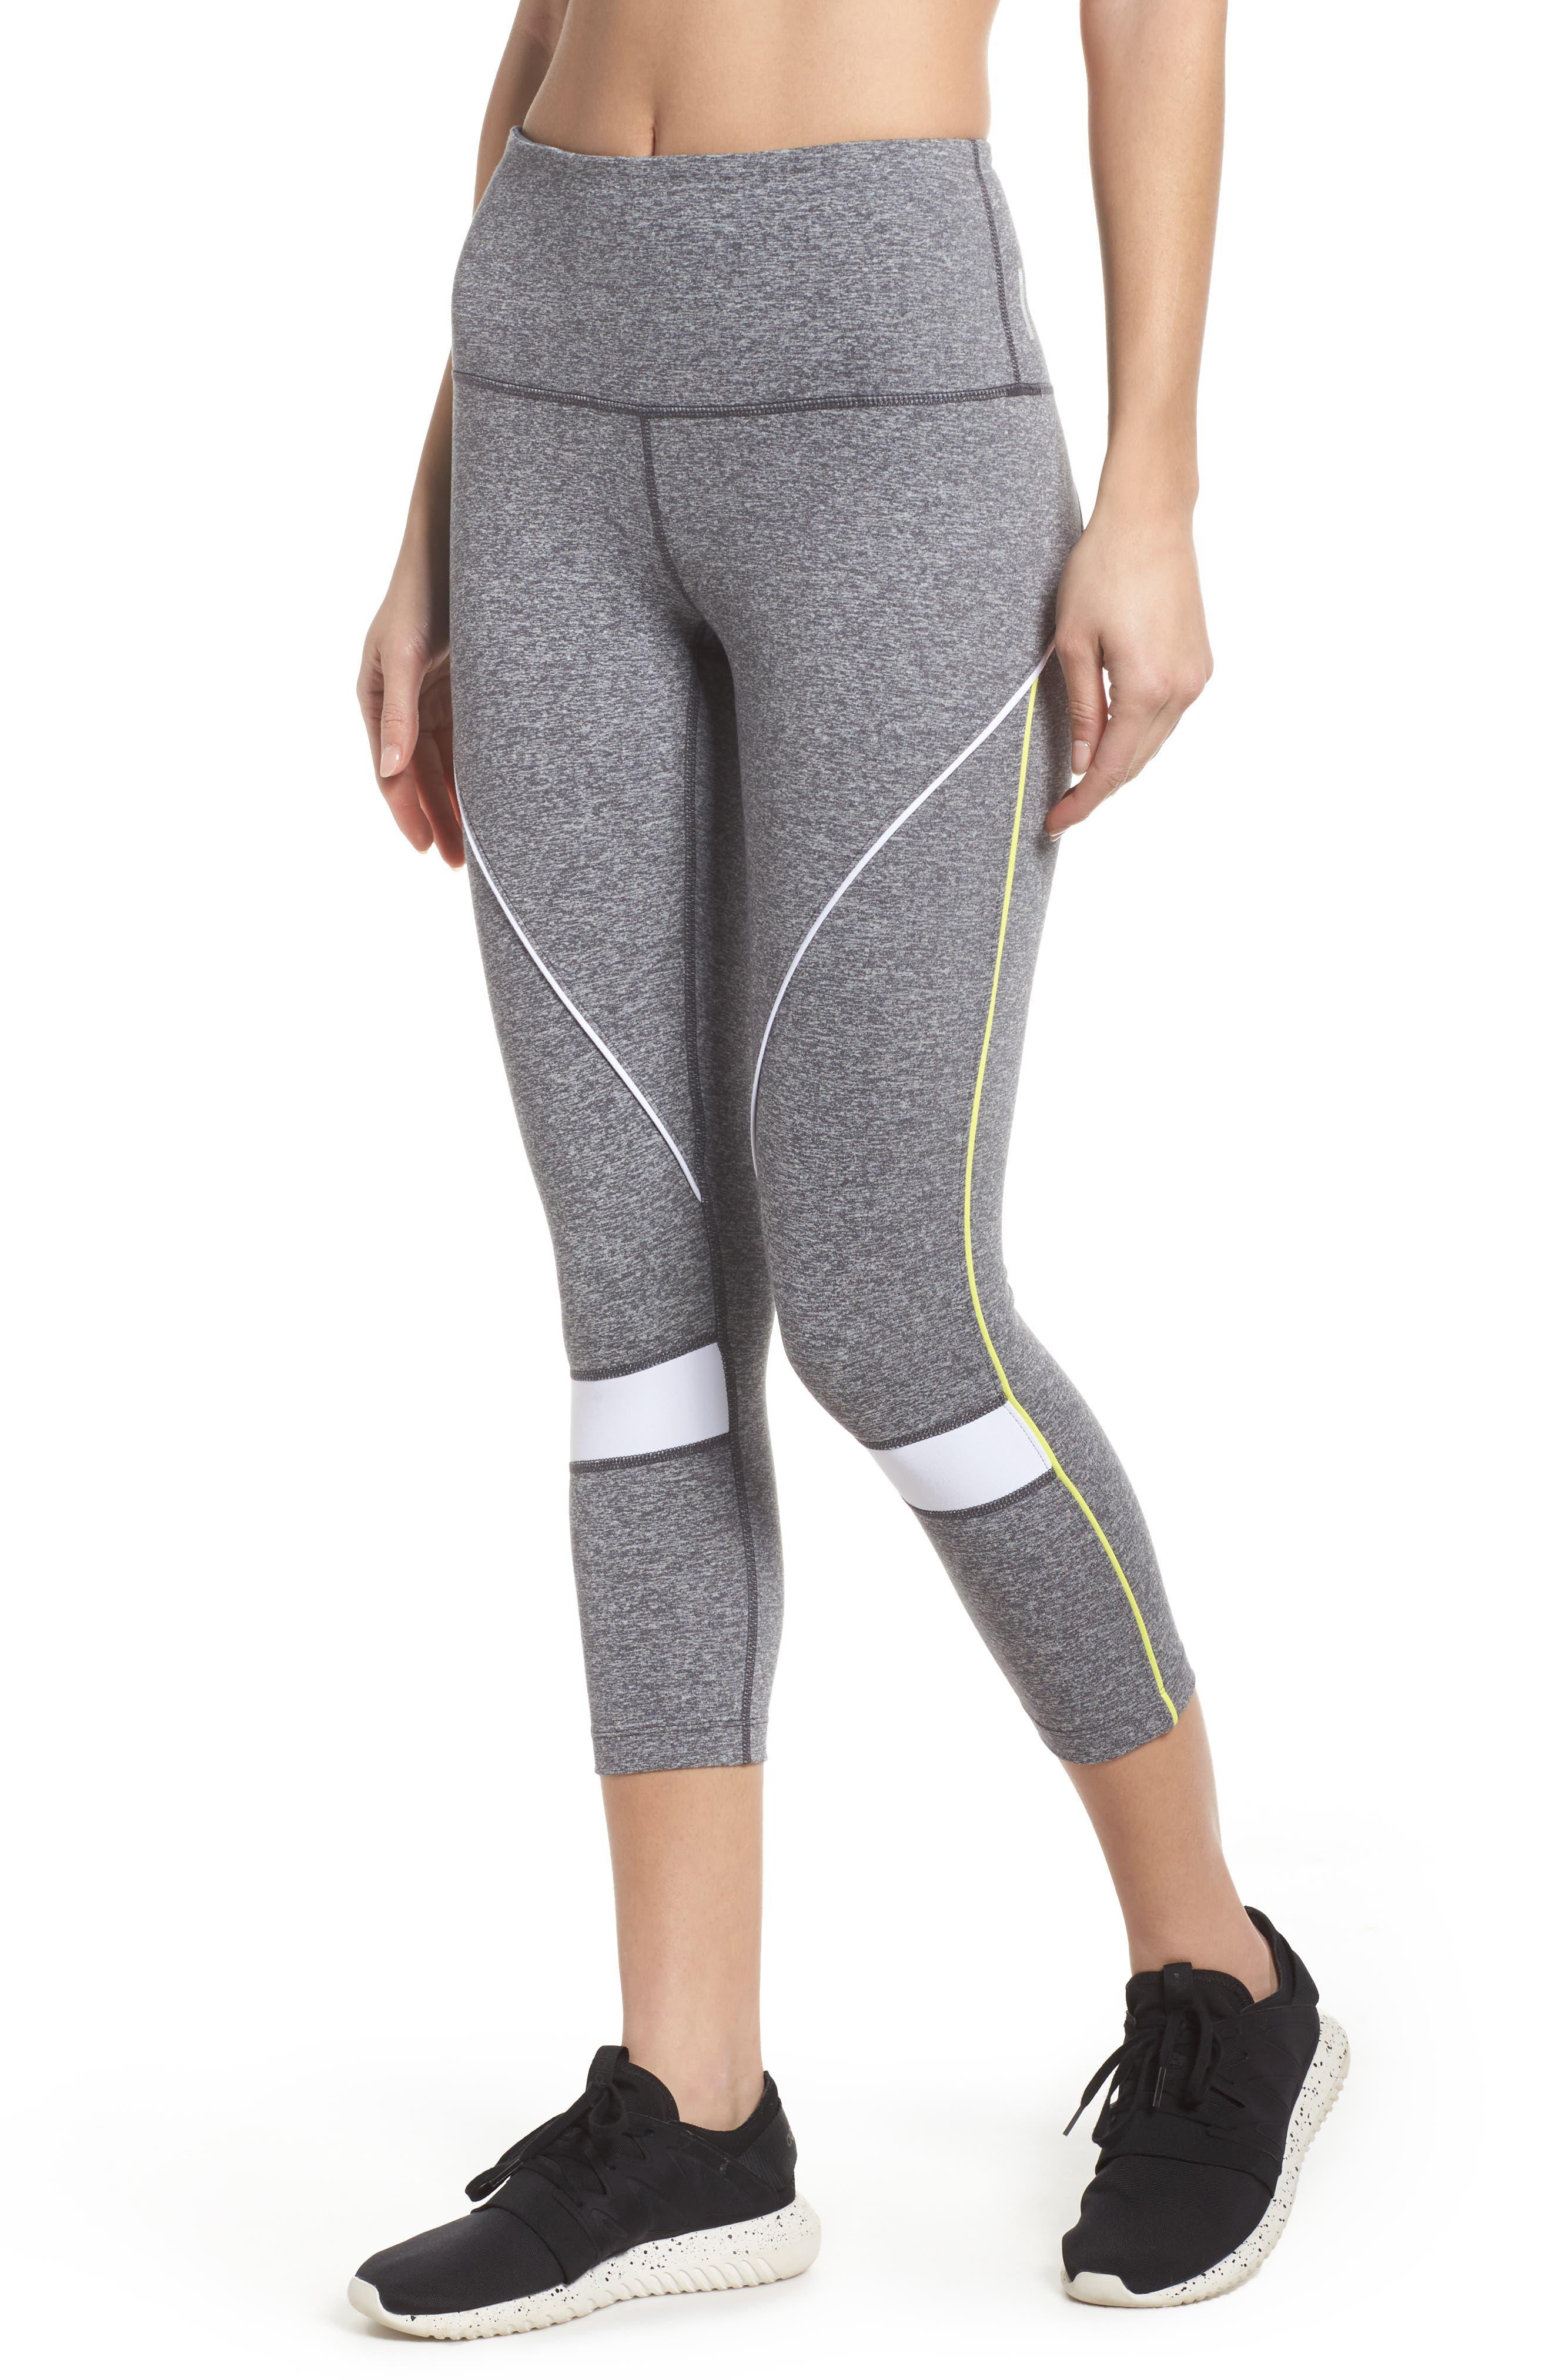 Piper High Waist Crop Leggings,                         Main,                         color, Grey Graphite Melange